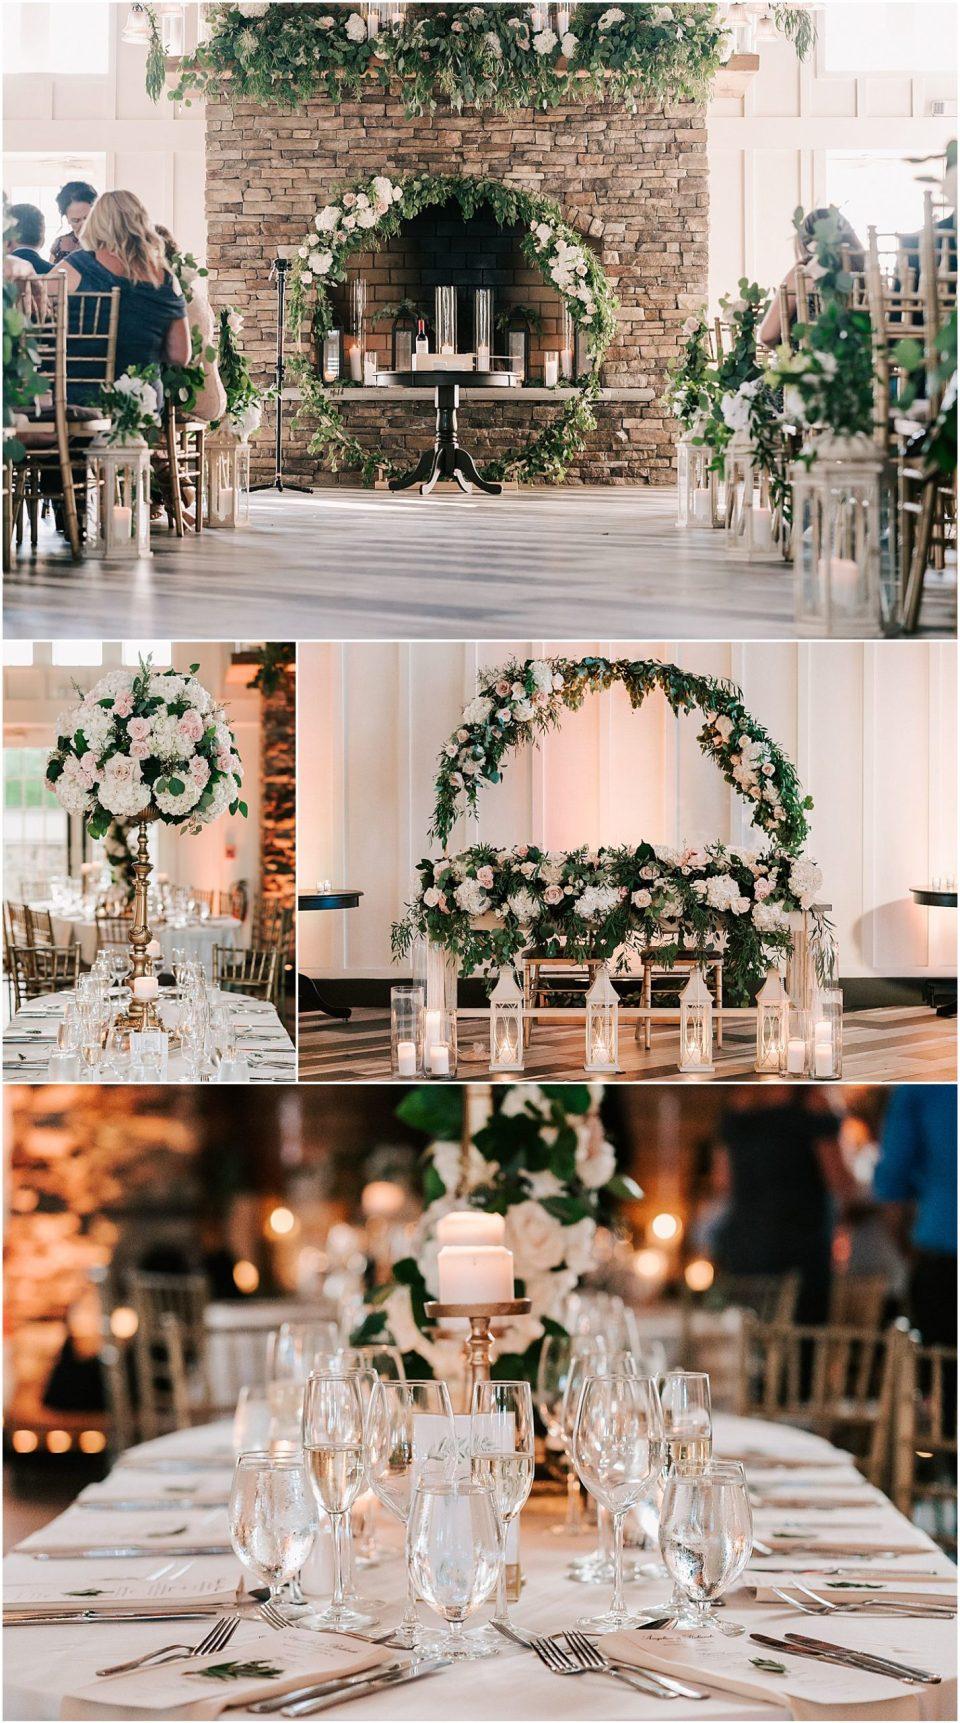 Wedding Details at this wedding venue